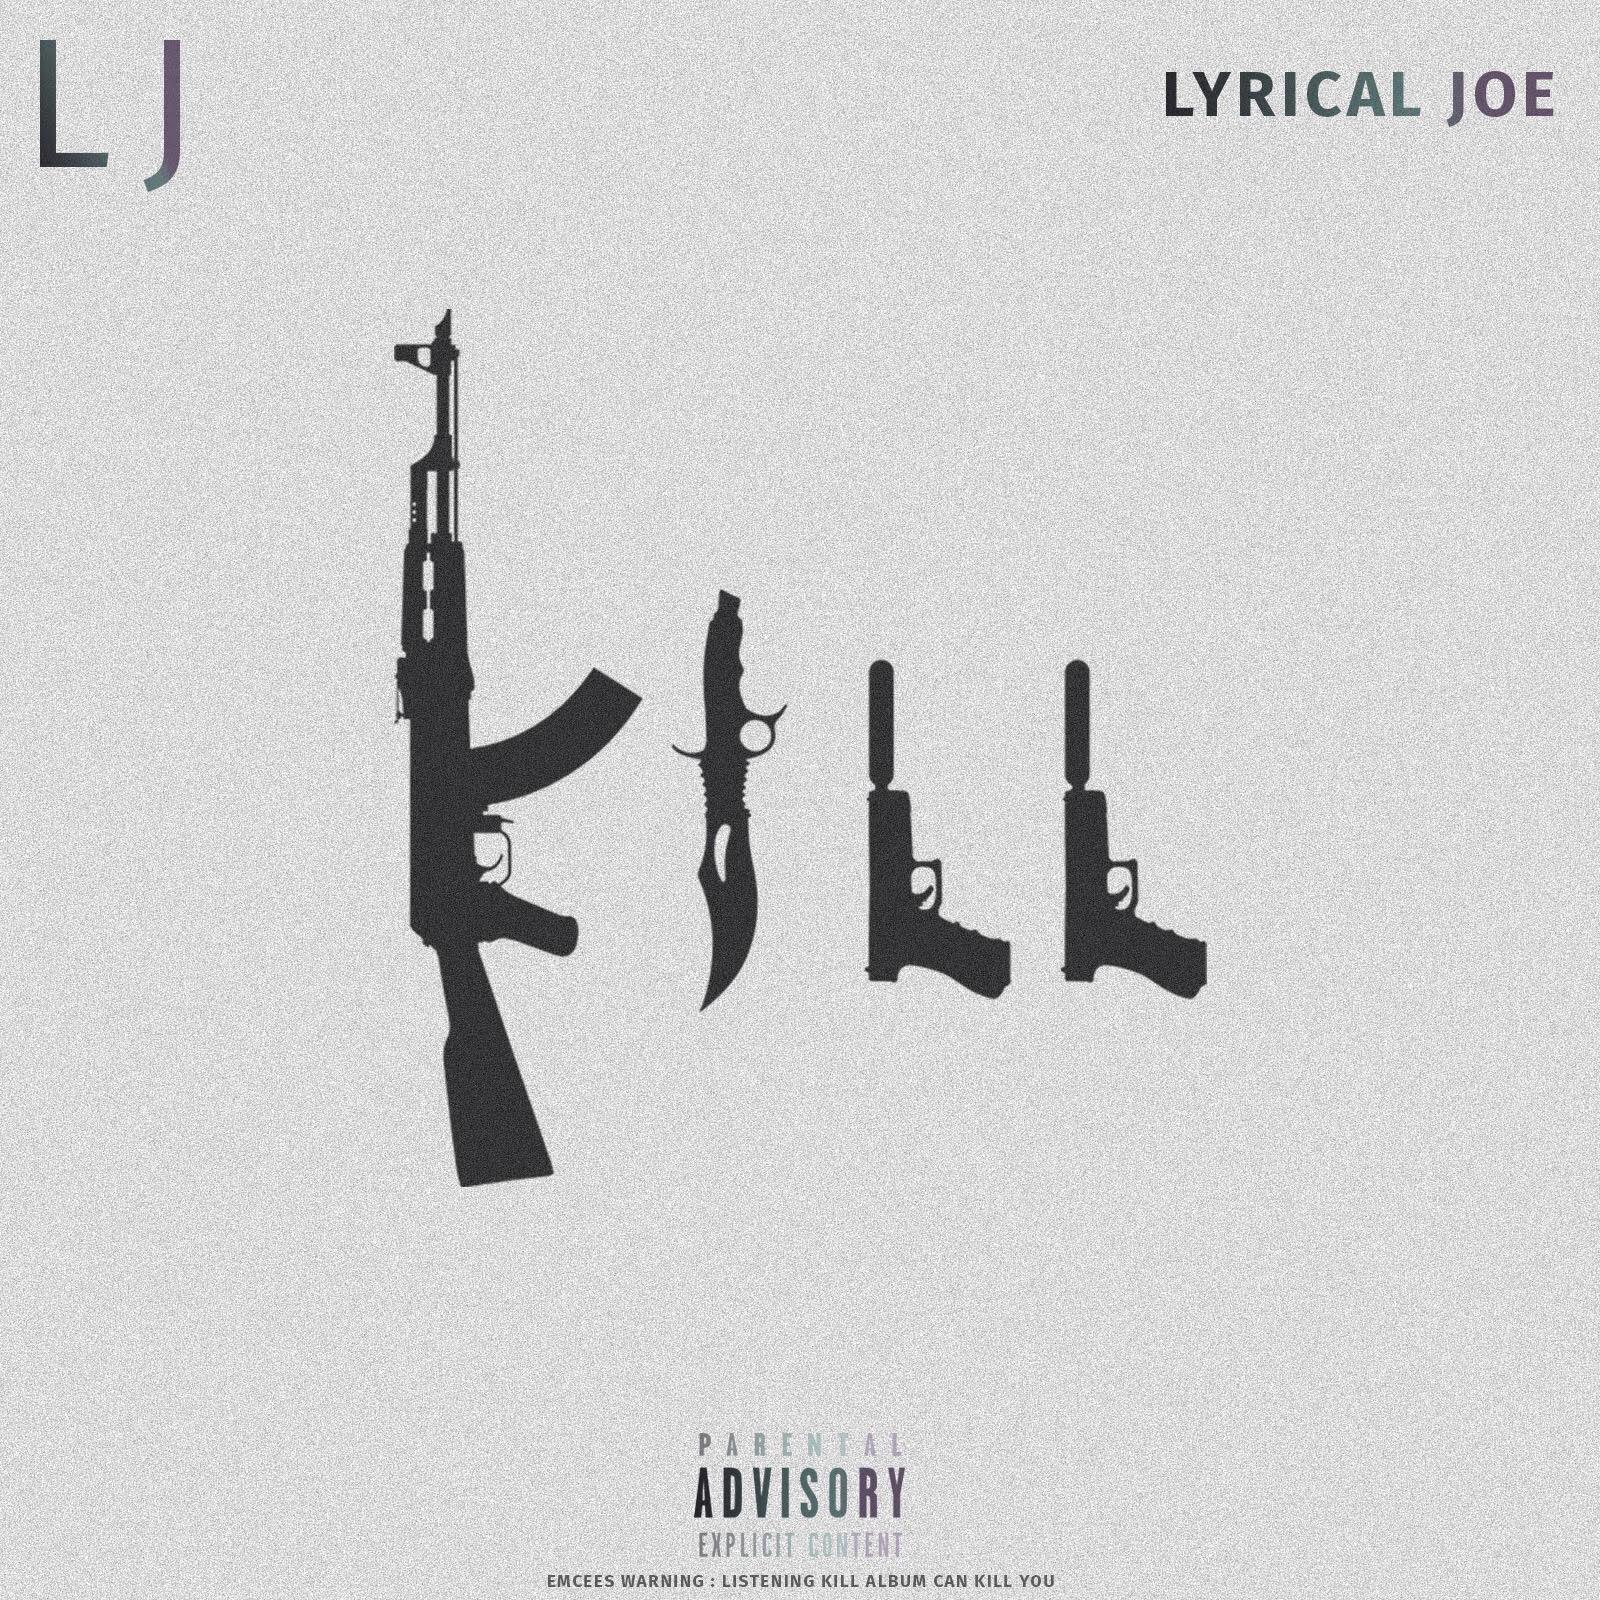 KILL by Lyrical Joe (LJ)